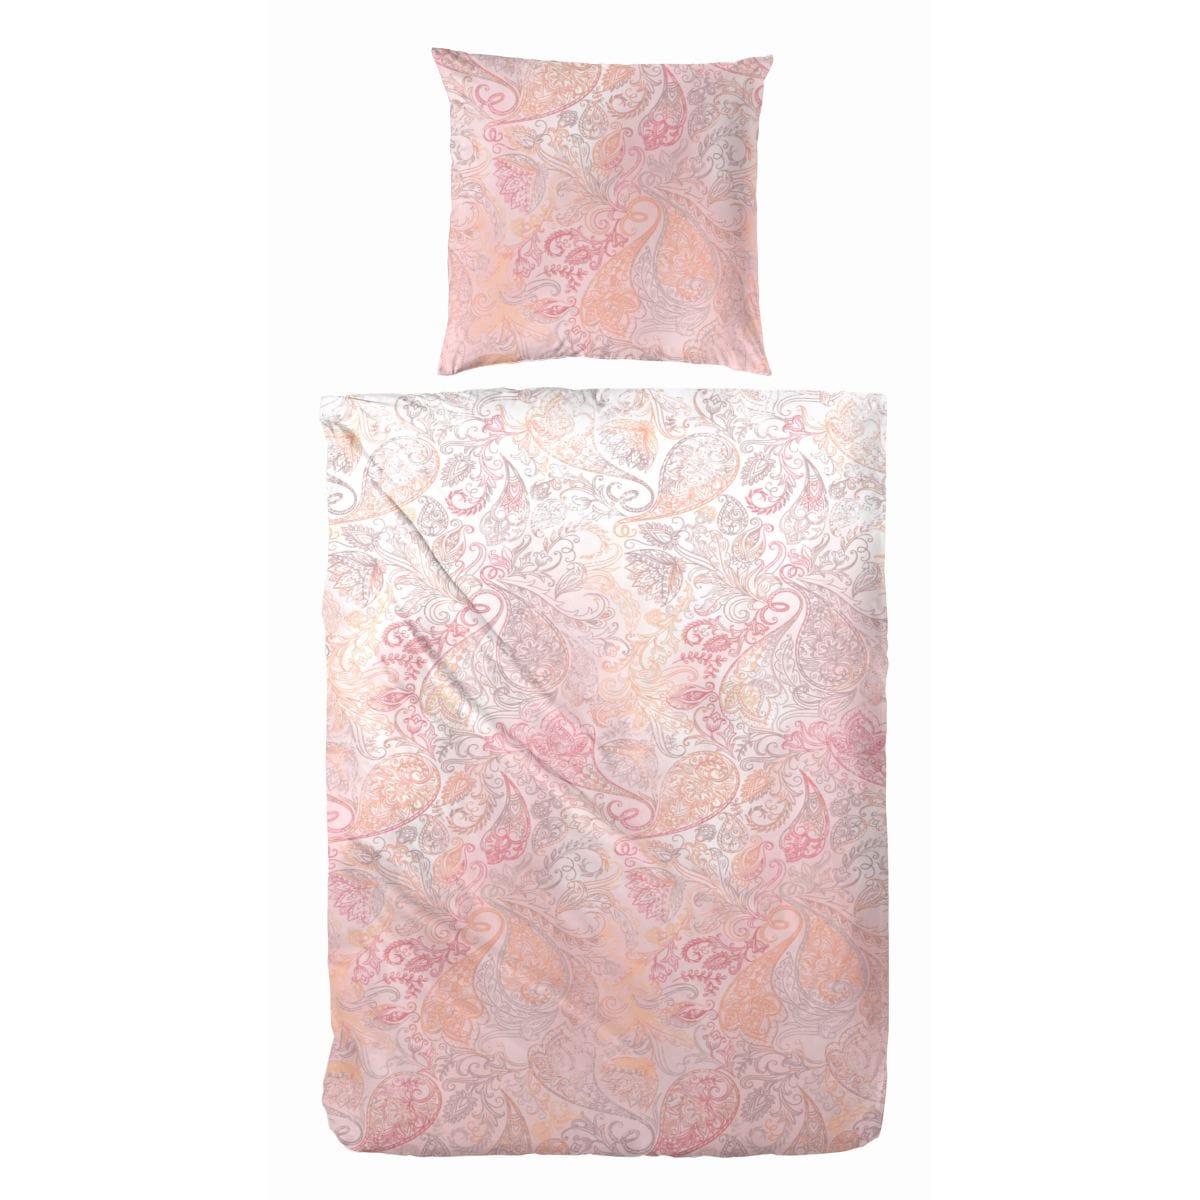 hahn bettw sche rosa orange 155 x 220 cm porta null. Black Bedroom Furniture Sets. Home Design Ideas